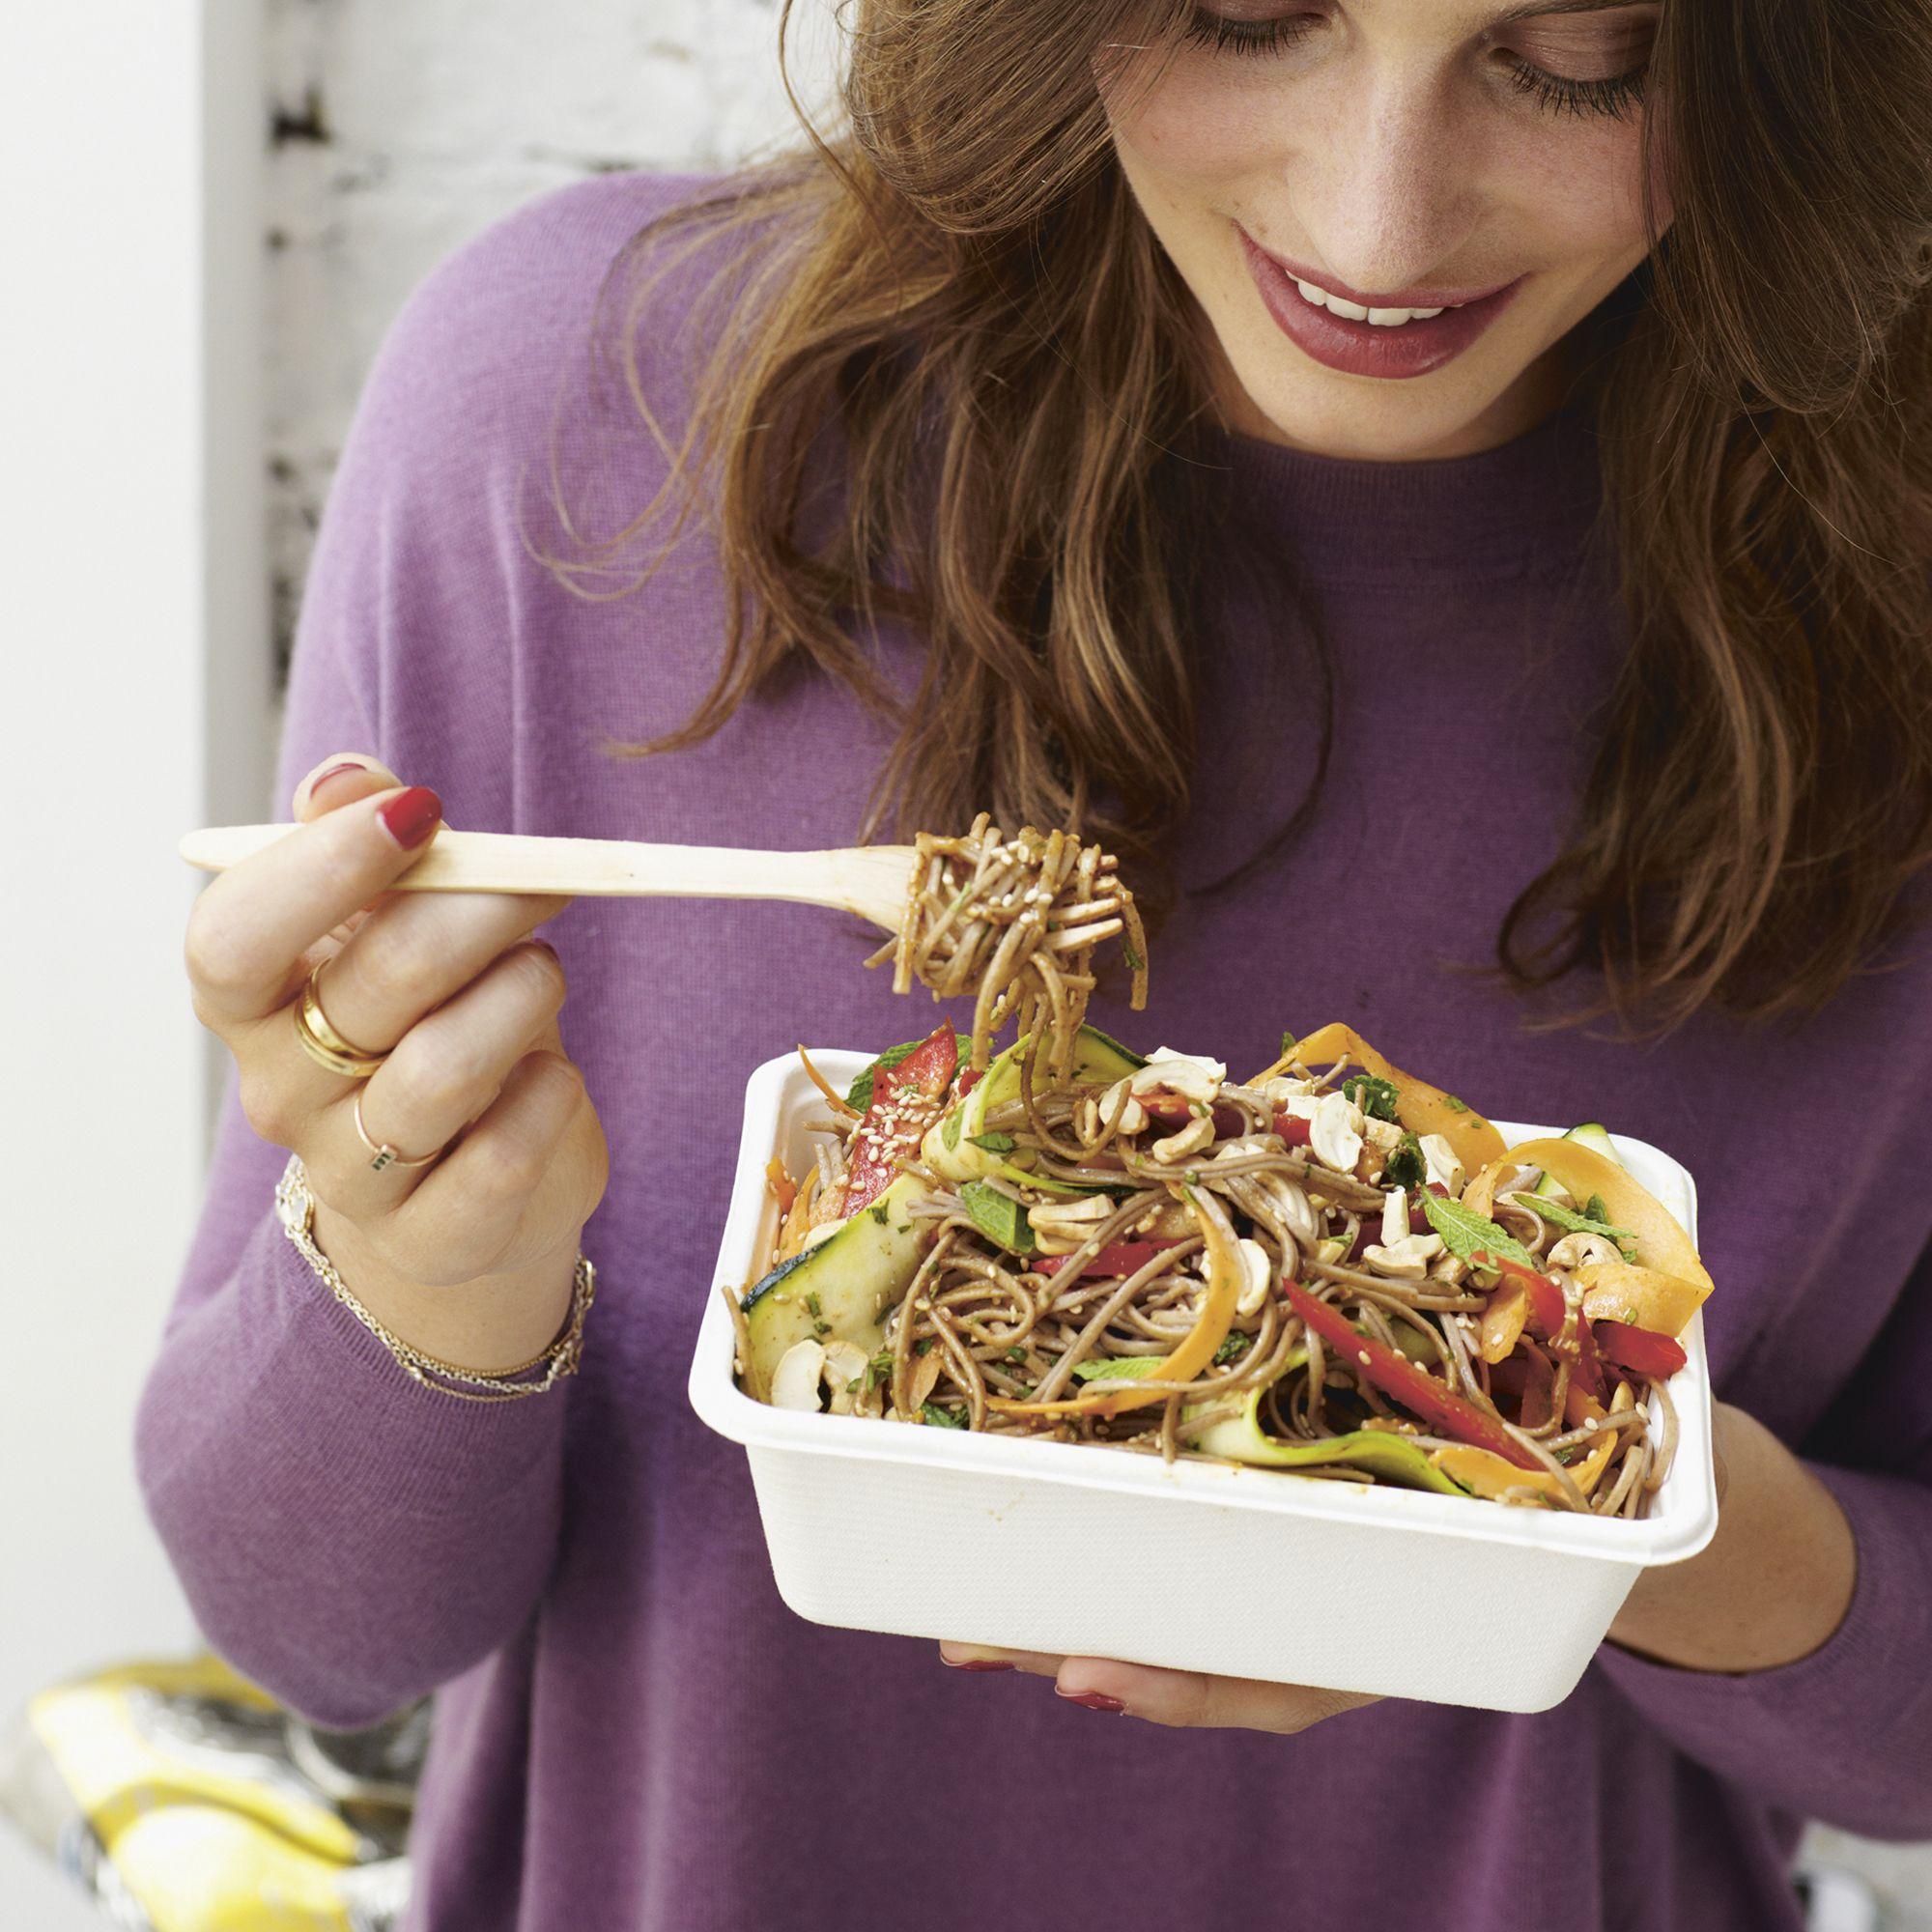 deliciously ella 39 s pad thai recipes vegetarian. Black Bedroom Furniture Sets. Home Design Ideas